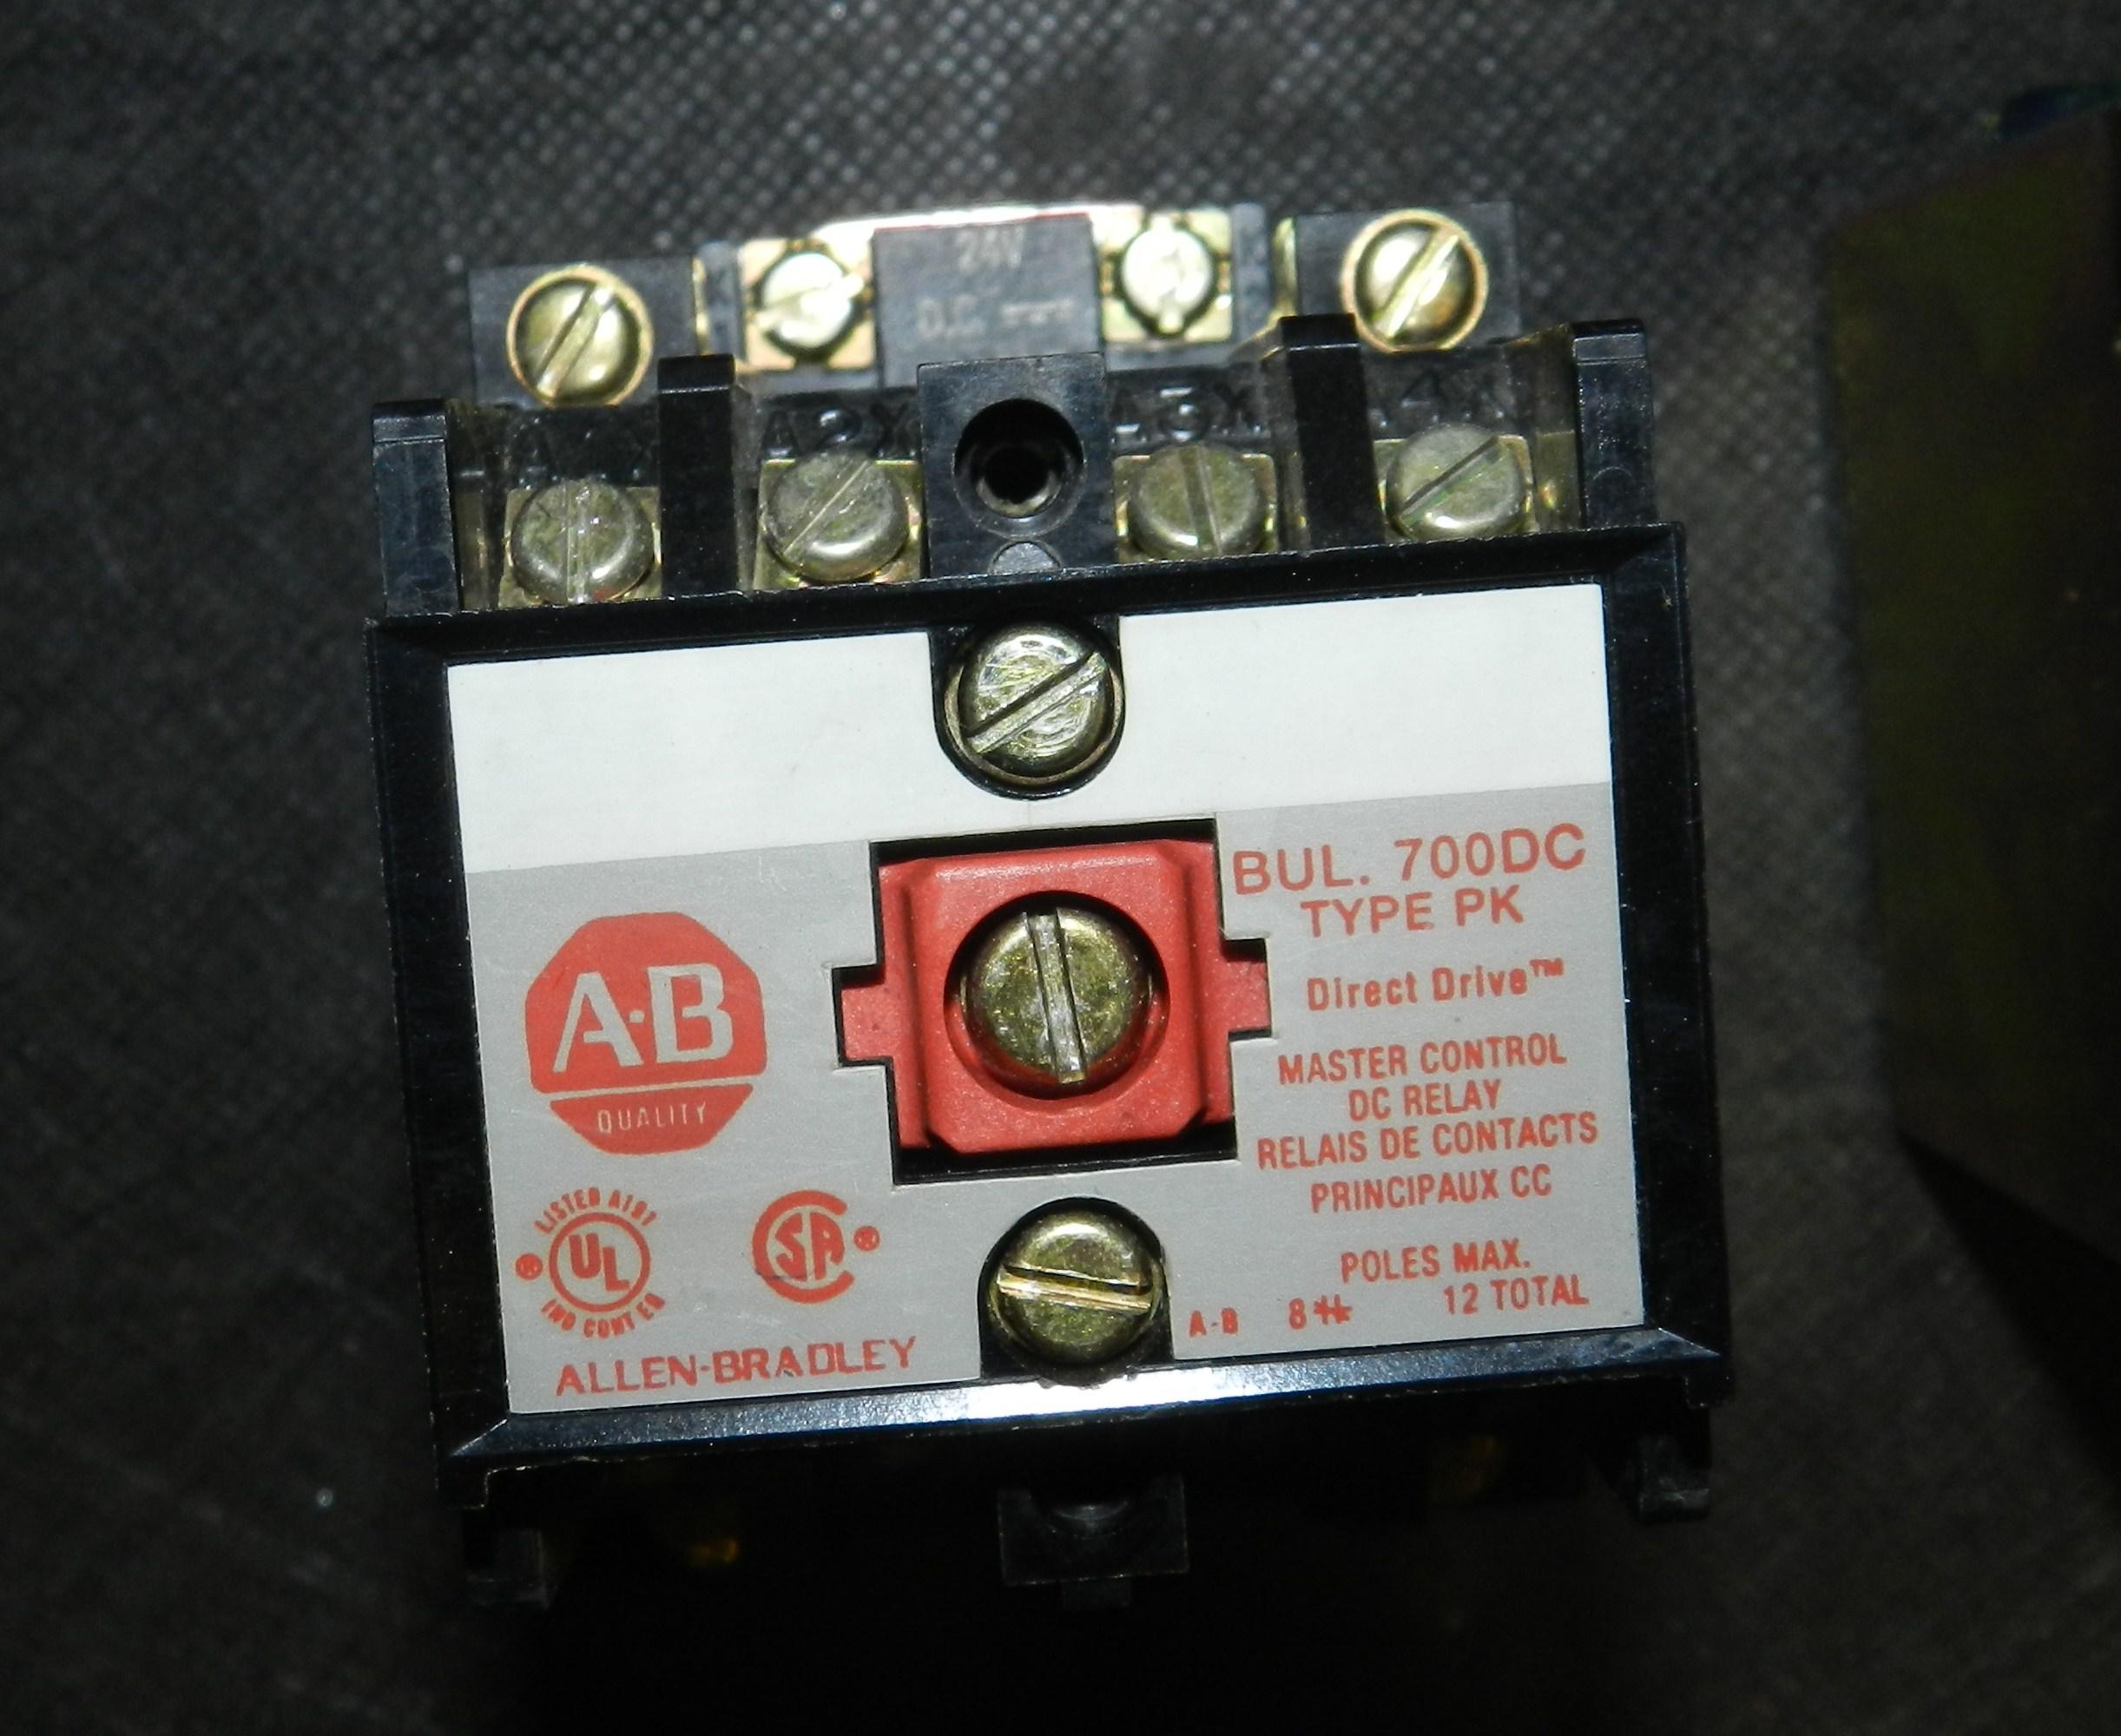 Lot 2 - Lot of 3 - Allen Bradley 700DC Relays Models: PK400Z24, P400Z24, PK1200A1